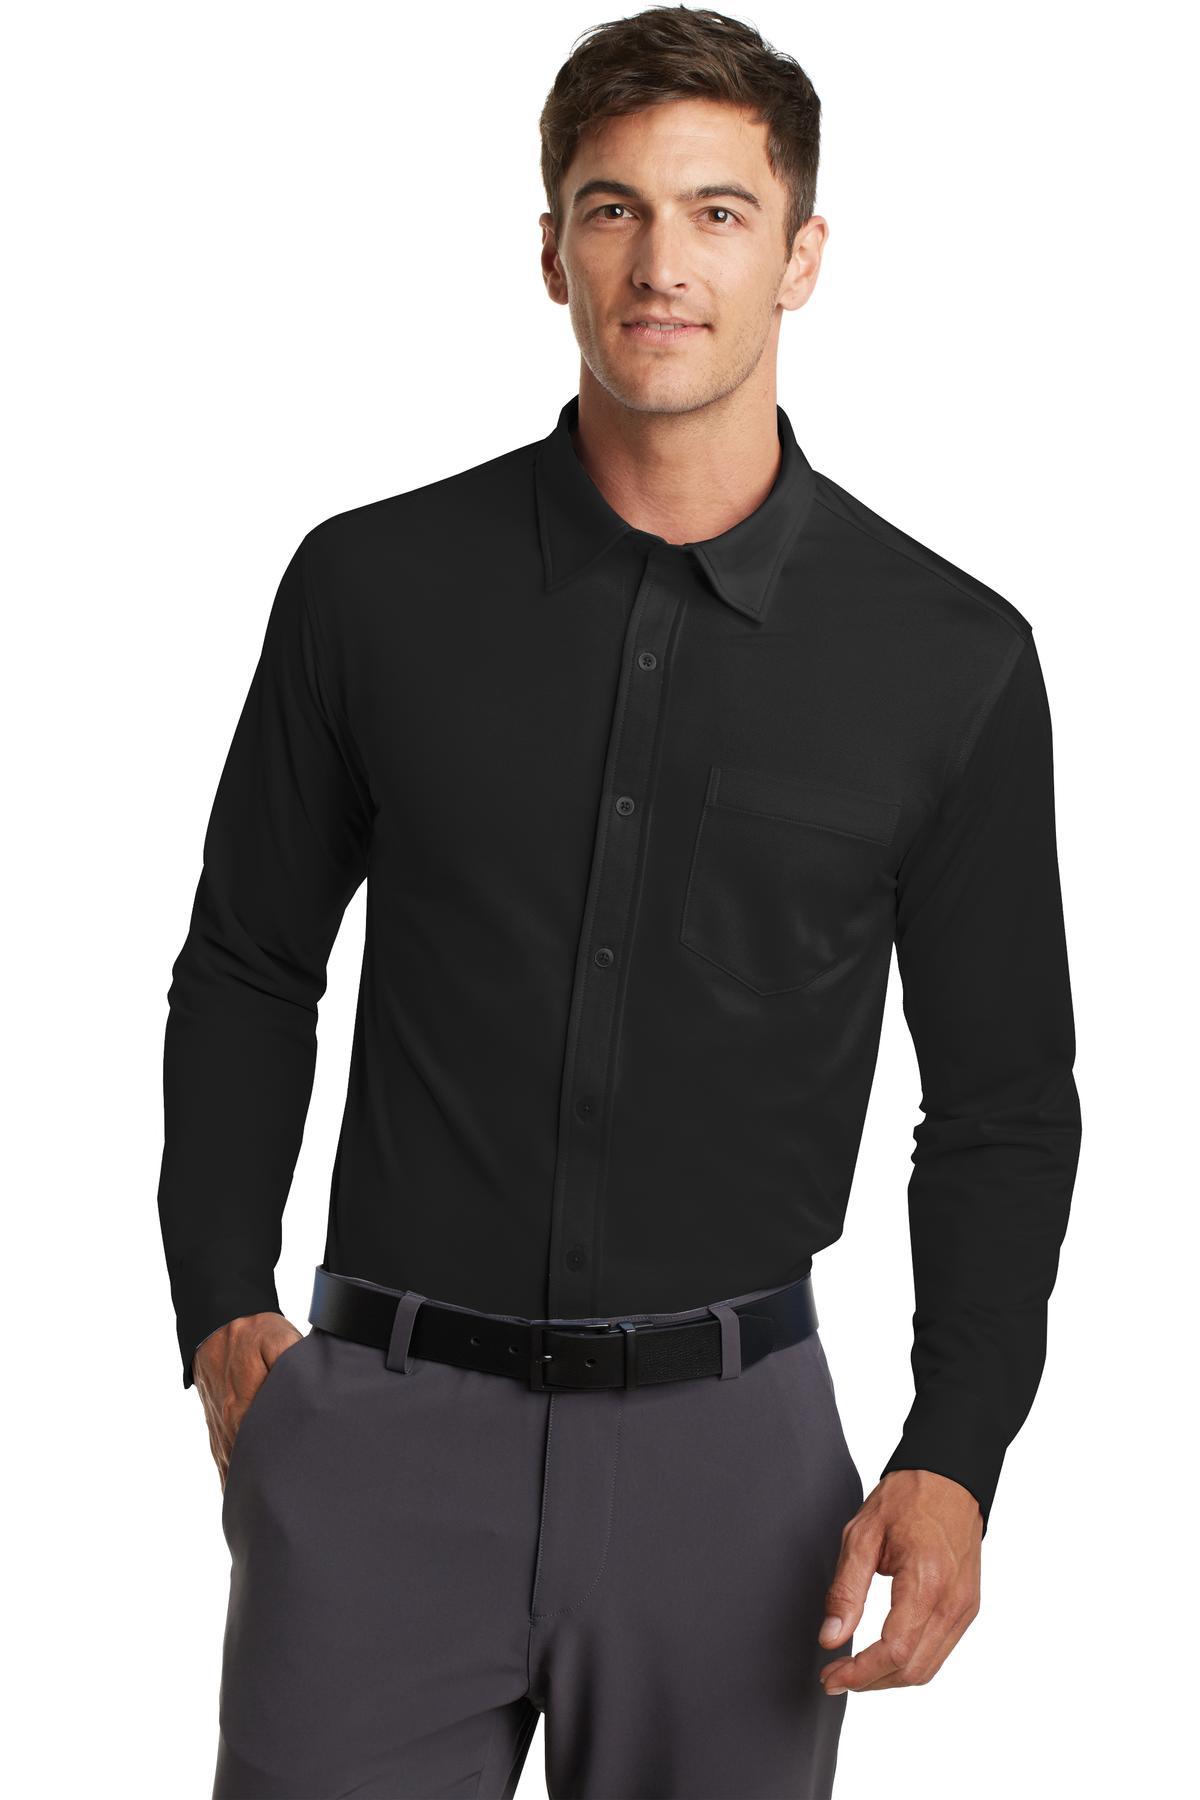 Port Authority Dimension Knit Dress Shirt Mens Oxford